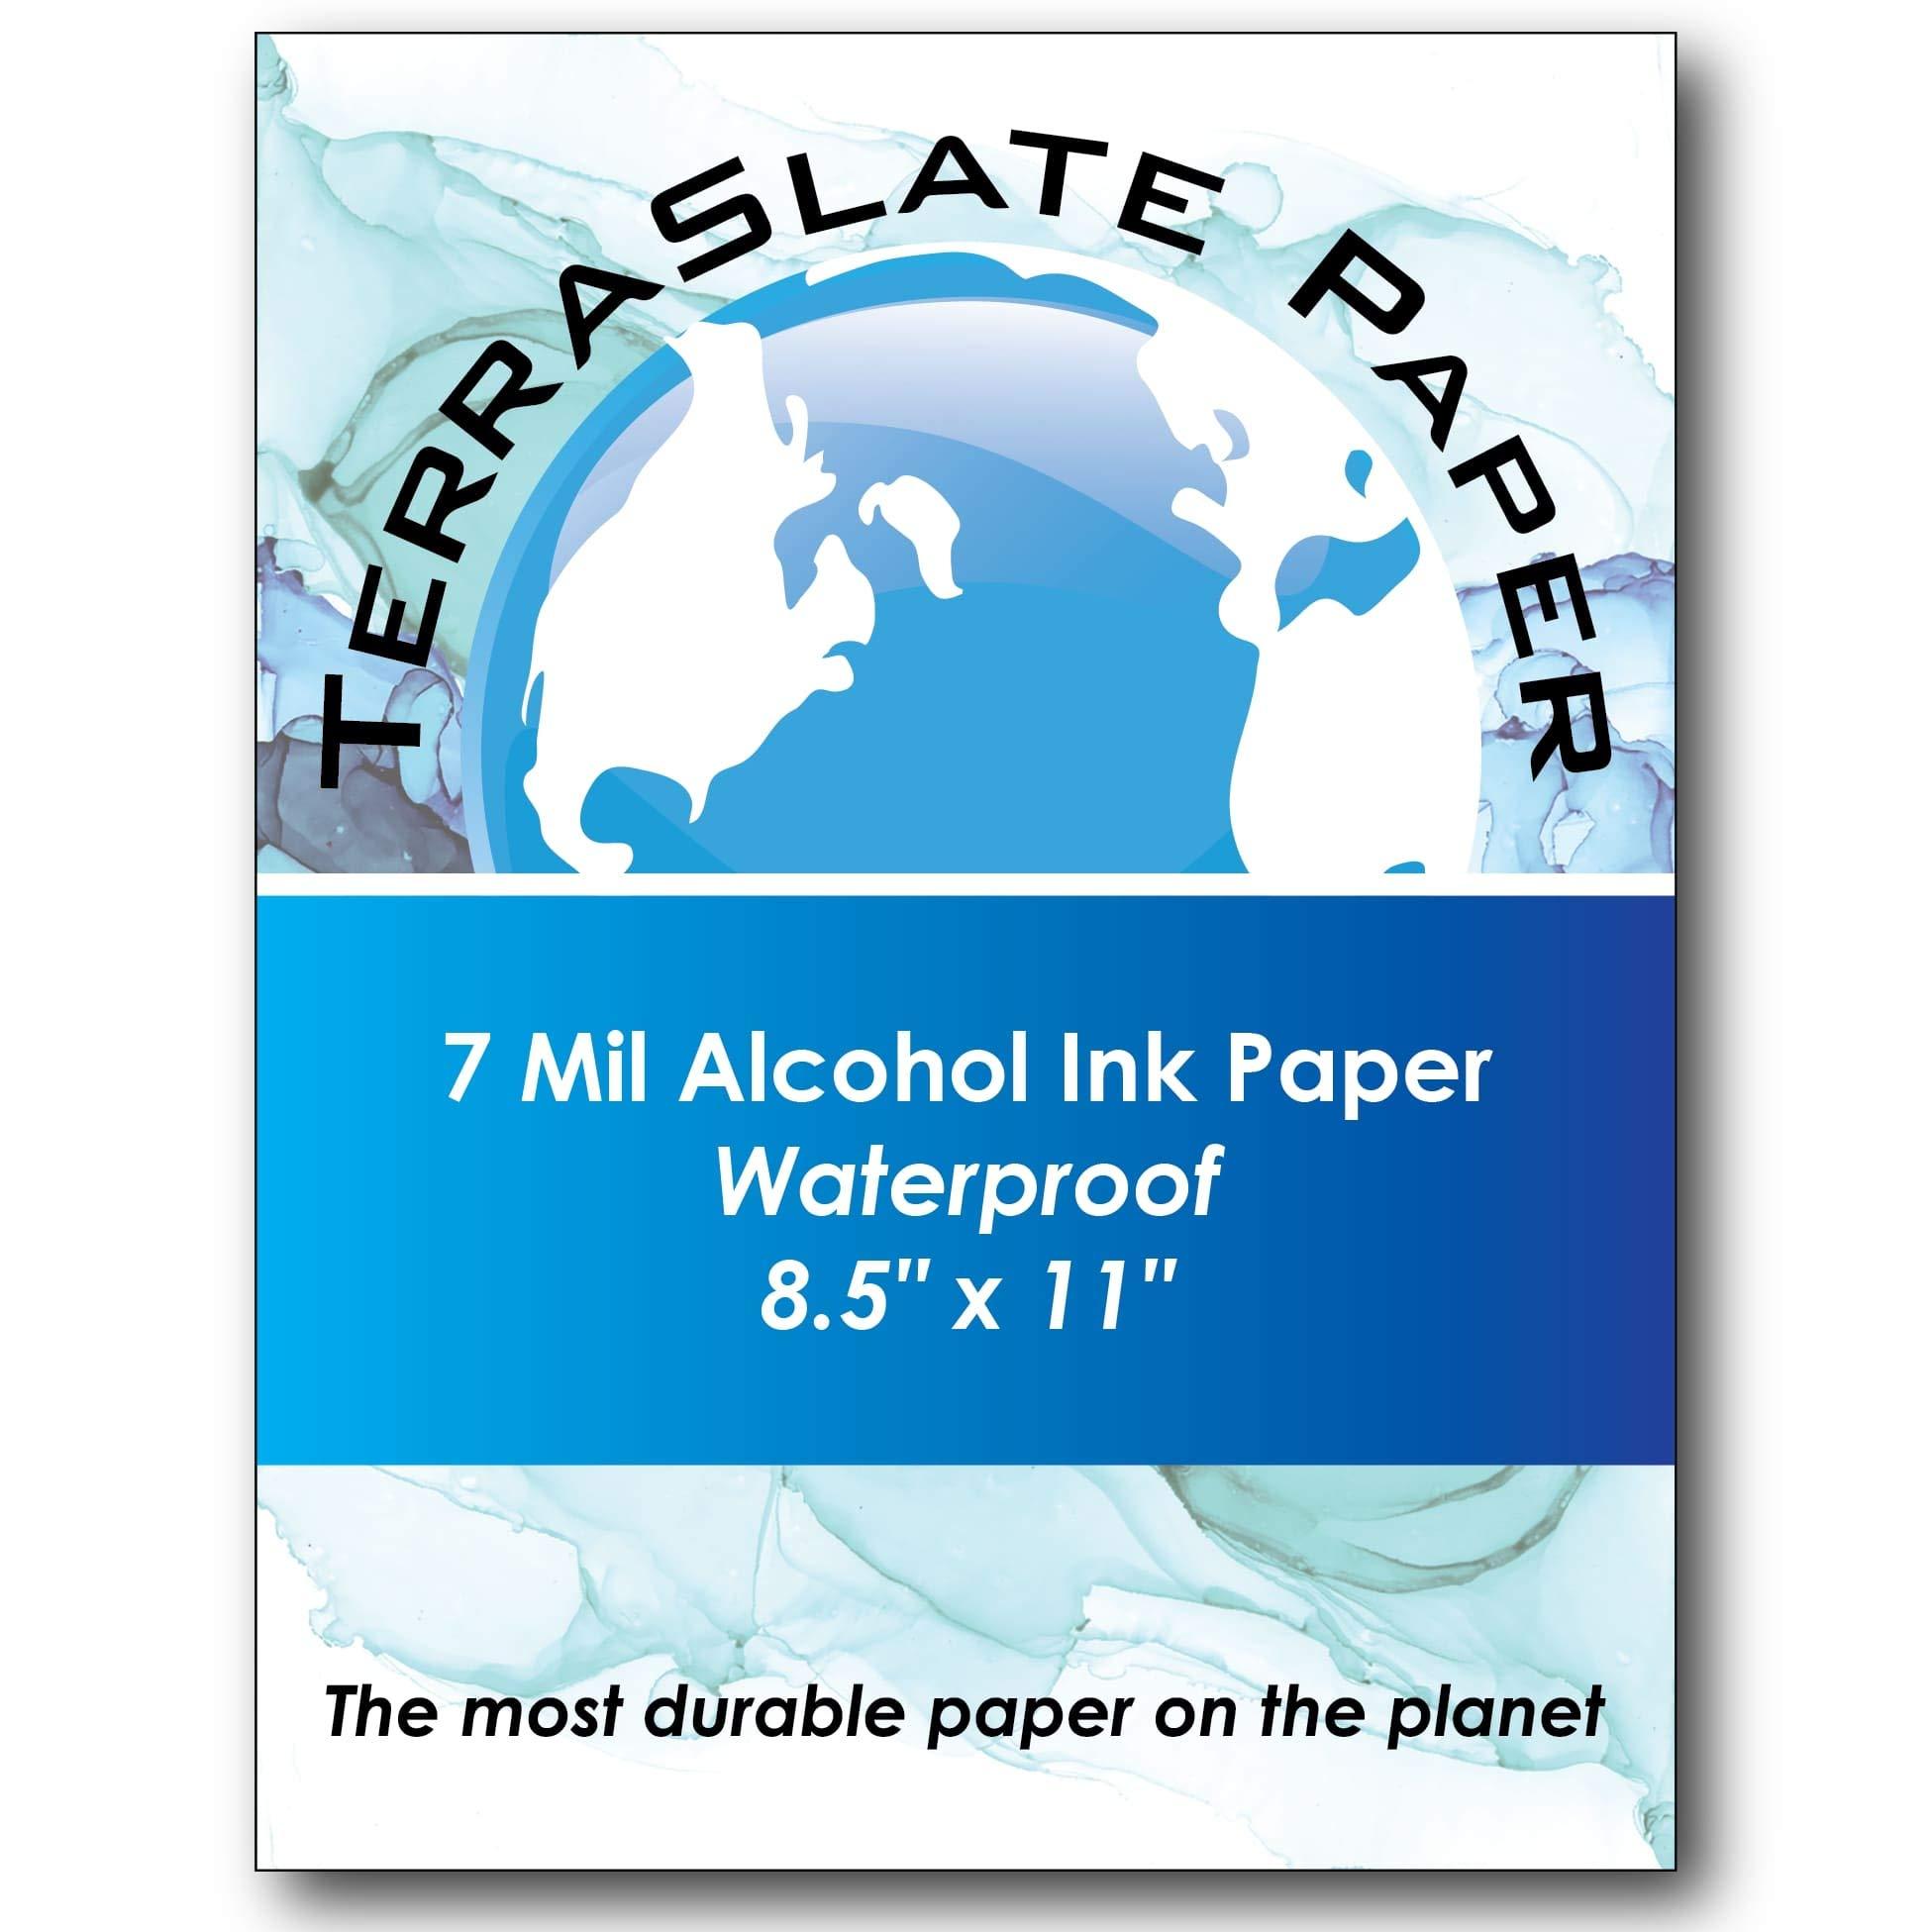 TerraSlate Paper 7 Mil 8.5'' x 11'' Alcohol Ink Art Paper 25 Sheets by TerraSlate